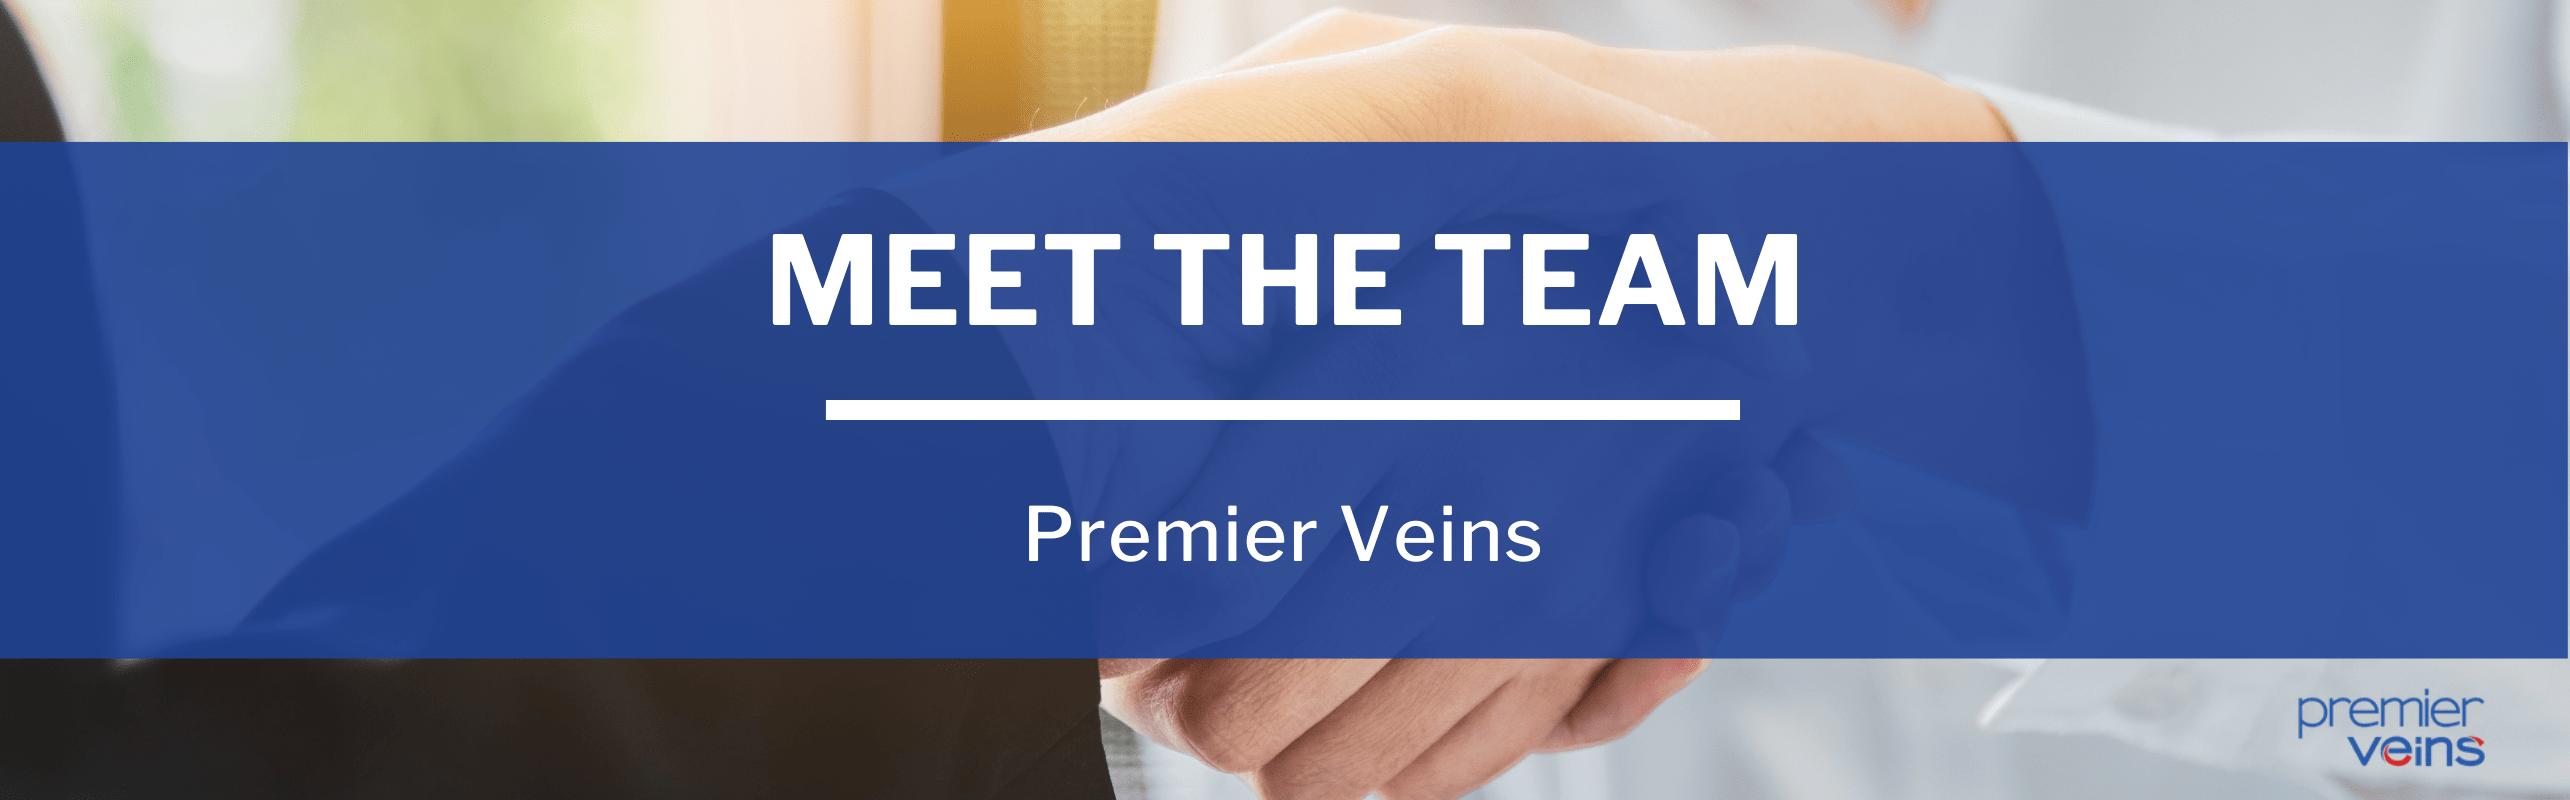 Meet the Premier Veins Team